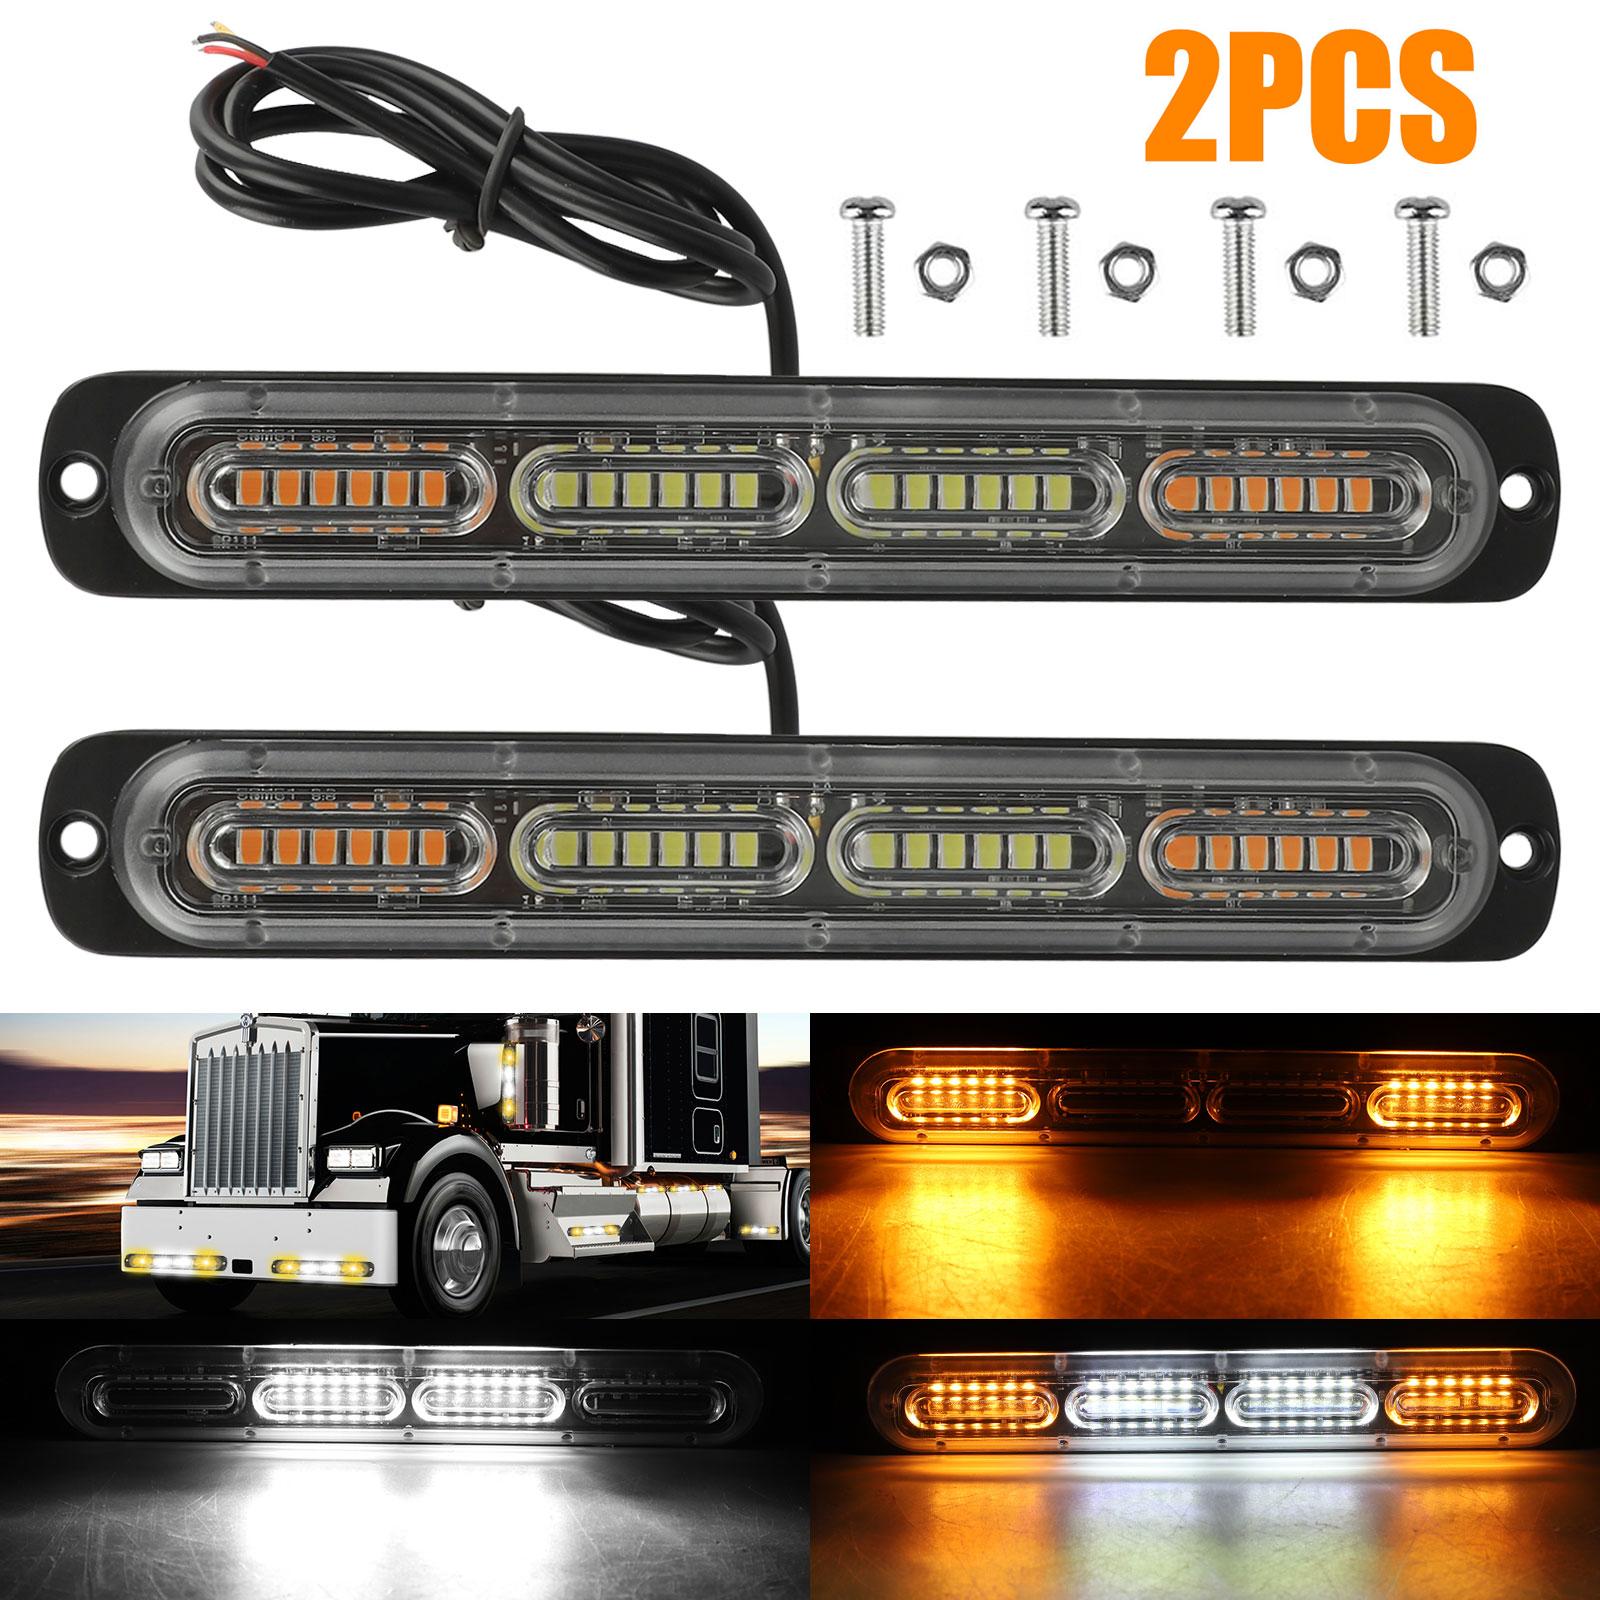 2PC-Amber-White-24LED-Car-Truck-Emergency-Warning-Hazard-Flash-Strobe-Light-Bar